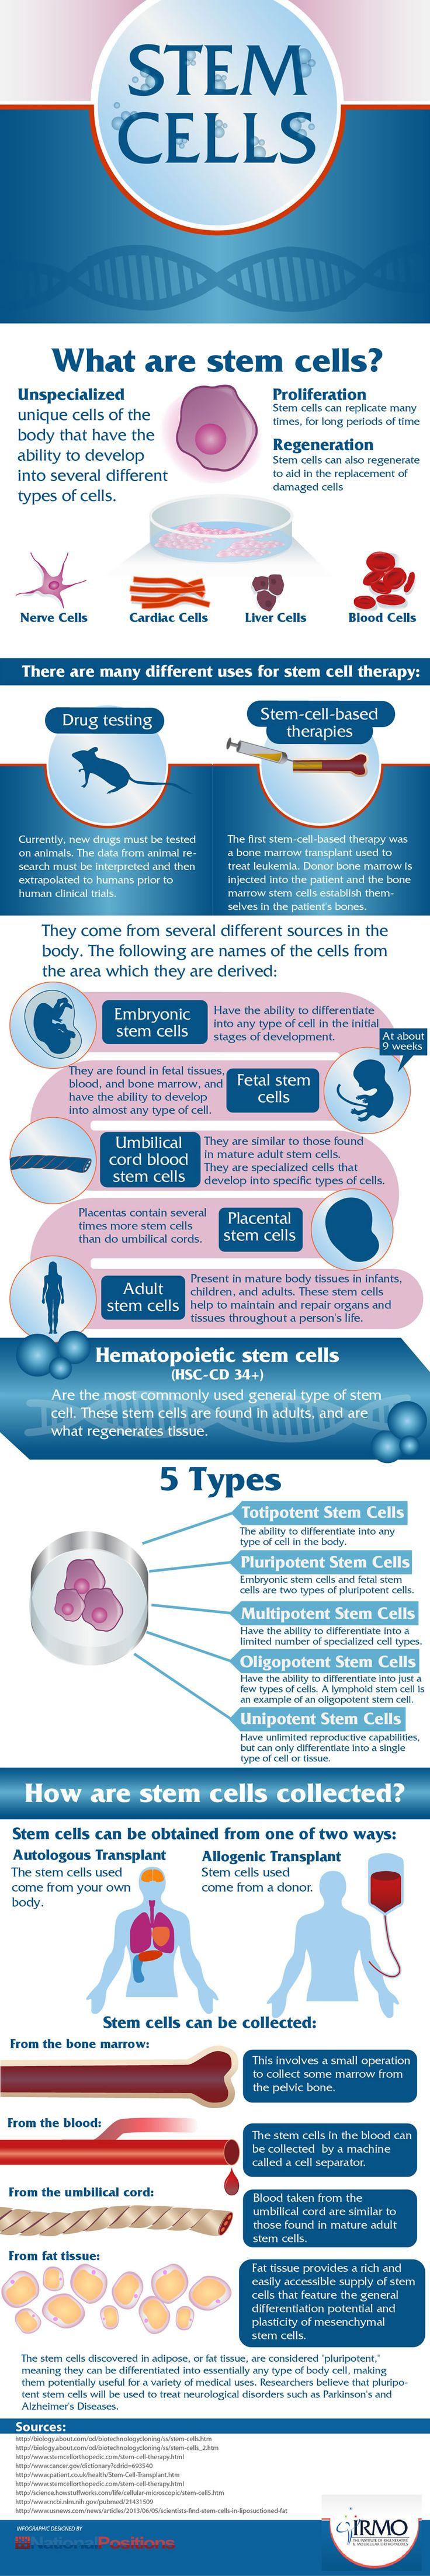 INFOGRAPHIC: NOT ALL STEM CELLS ARE CREATED EQUAL [Stem Cells: http://futuristicnews.com/tag/stem-cells/]